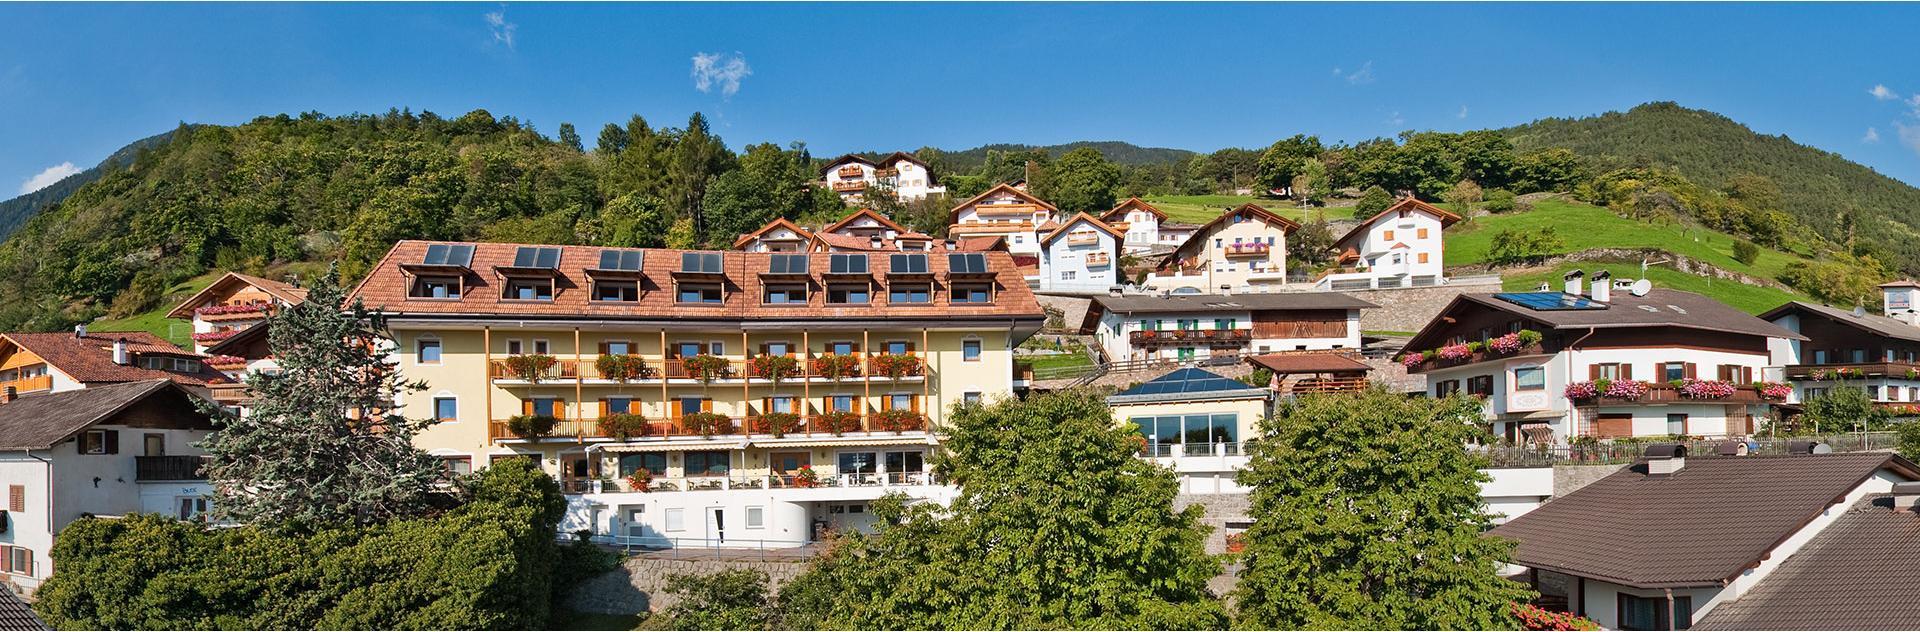 Hotel Barbian bei Klausen